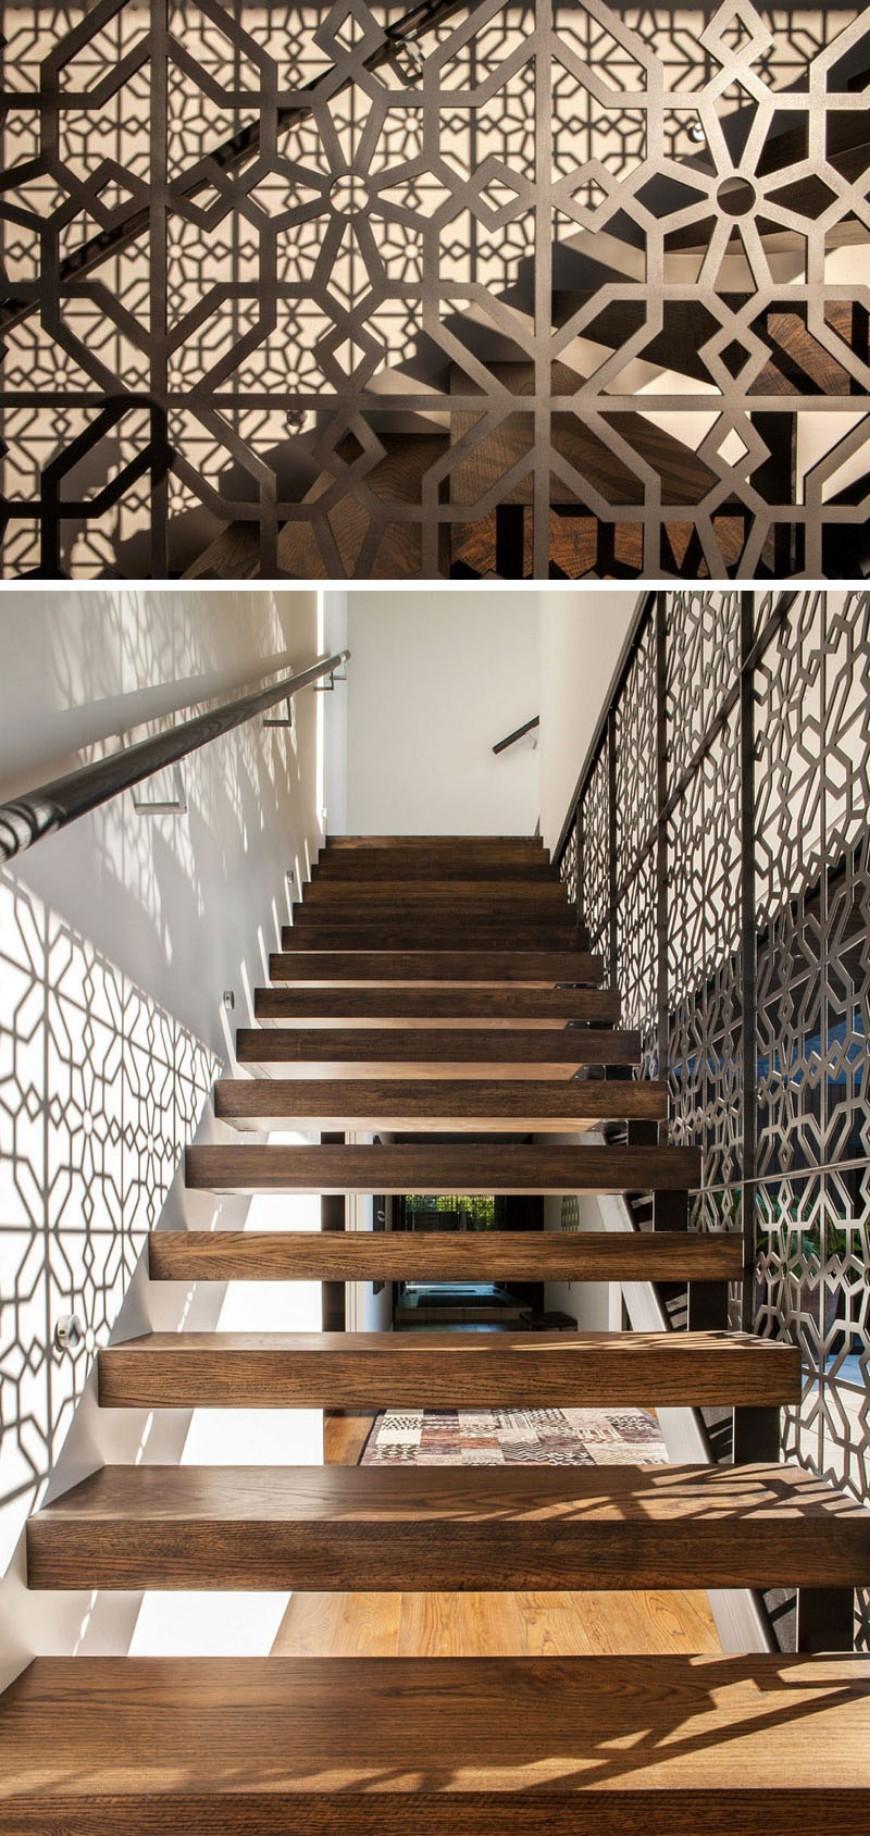 Creative Stair Railings For Your Modern Home | Modern Home ...